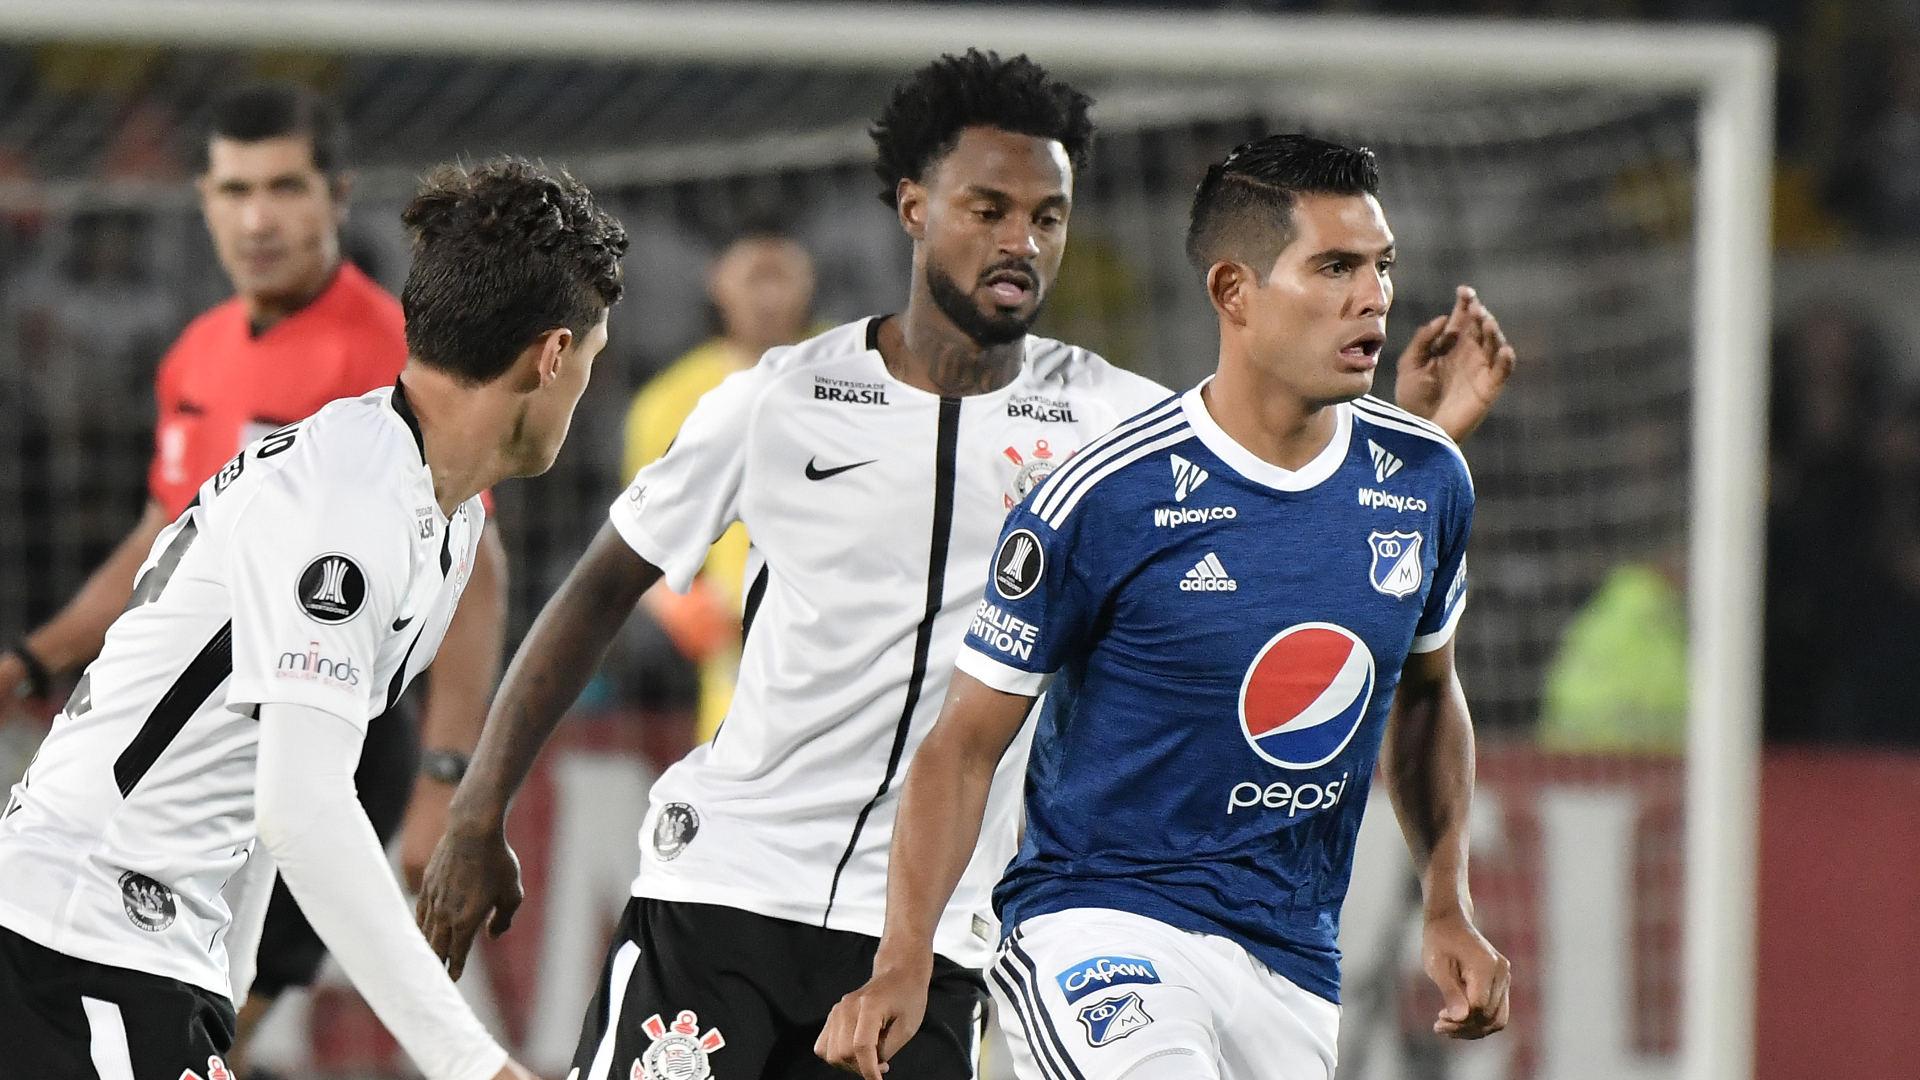 Rene Junior Macalister Silva Millonarios Corinthians 28022018 Copa Libertadores